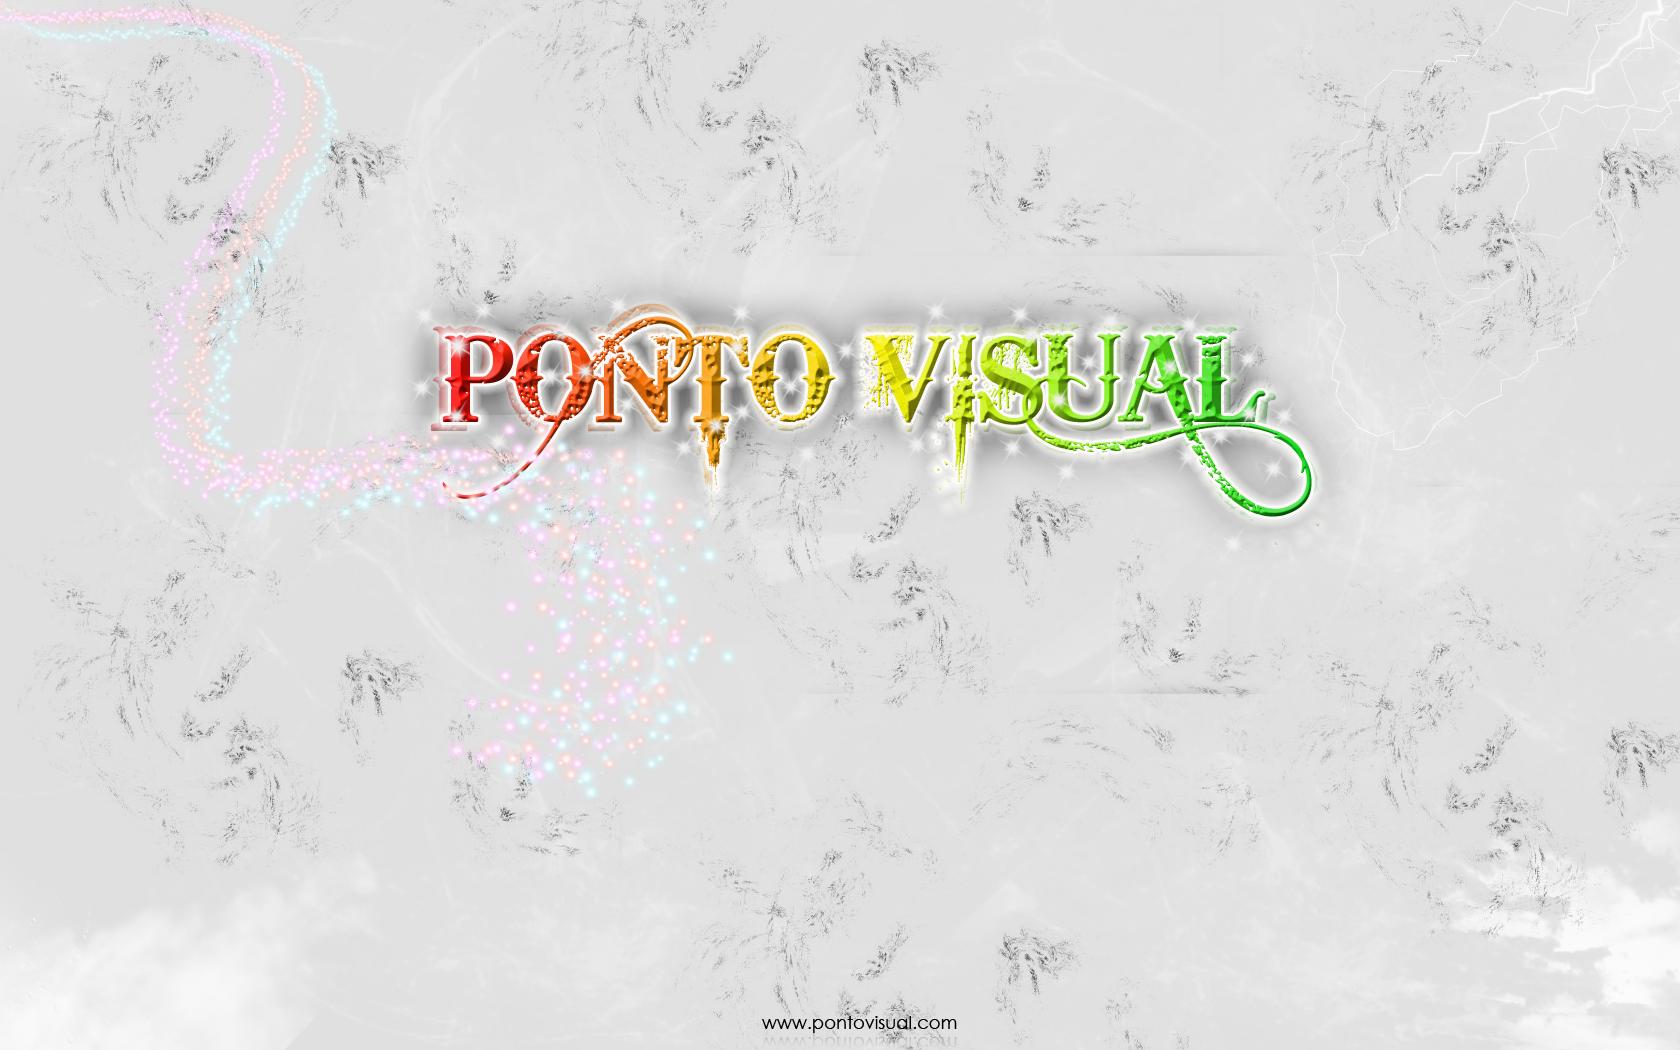 Wallpaper Design Ponto Visual by alexandreperei